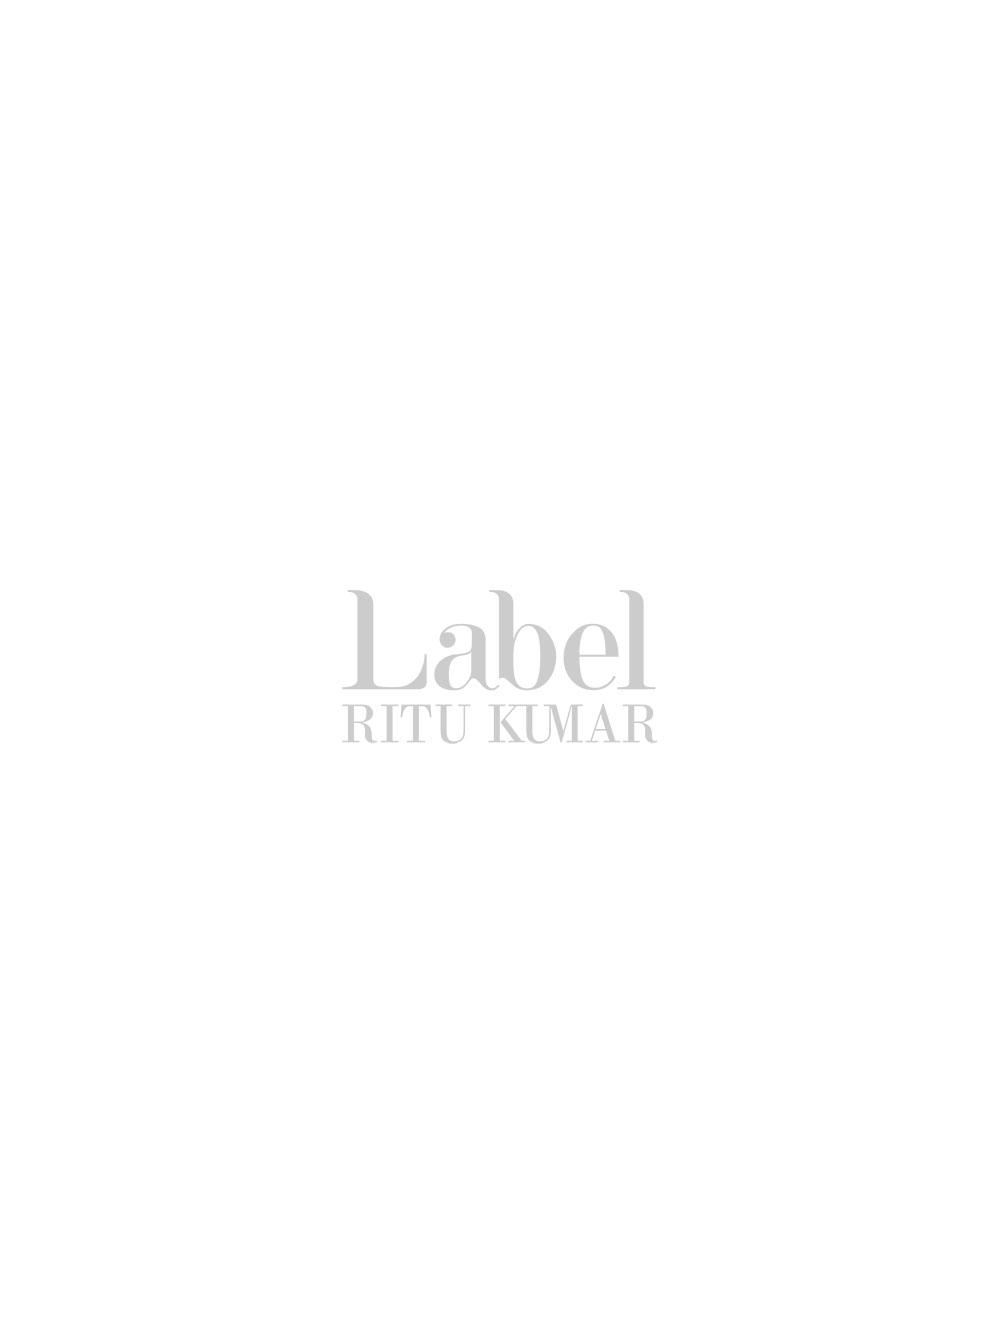 The Paisley Dress by Label Ritu Kumar